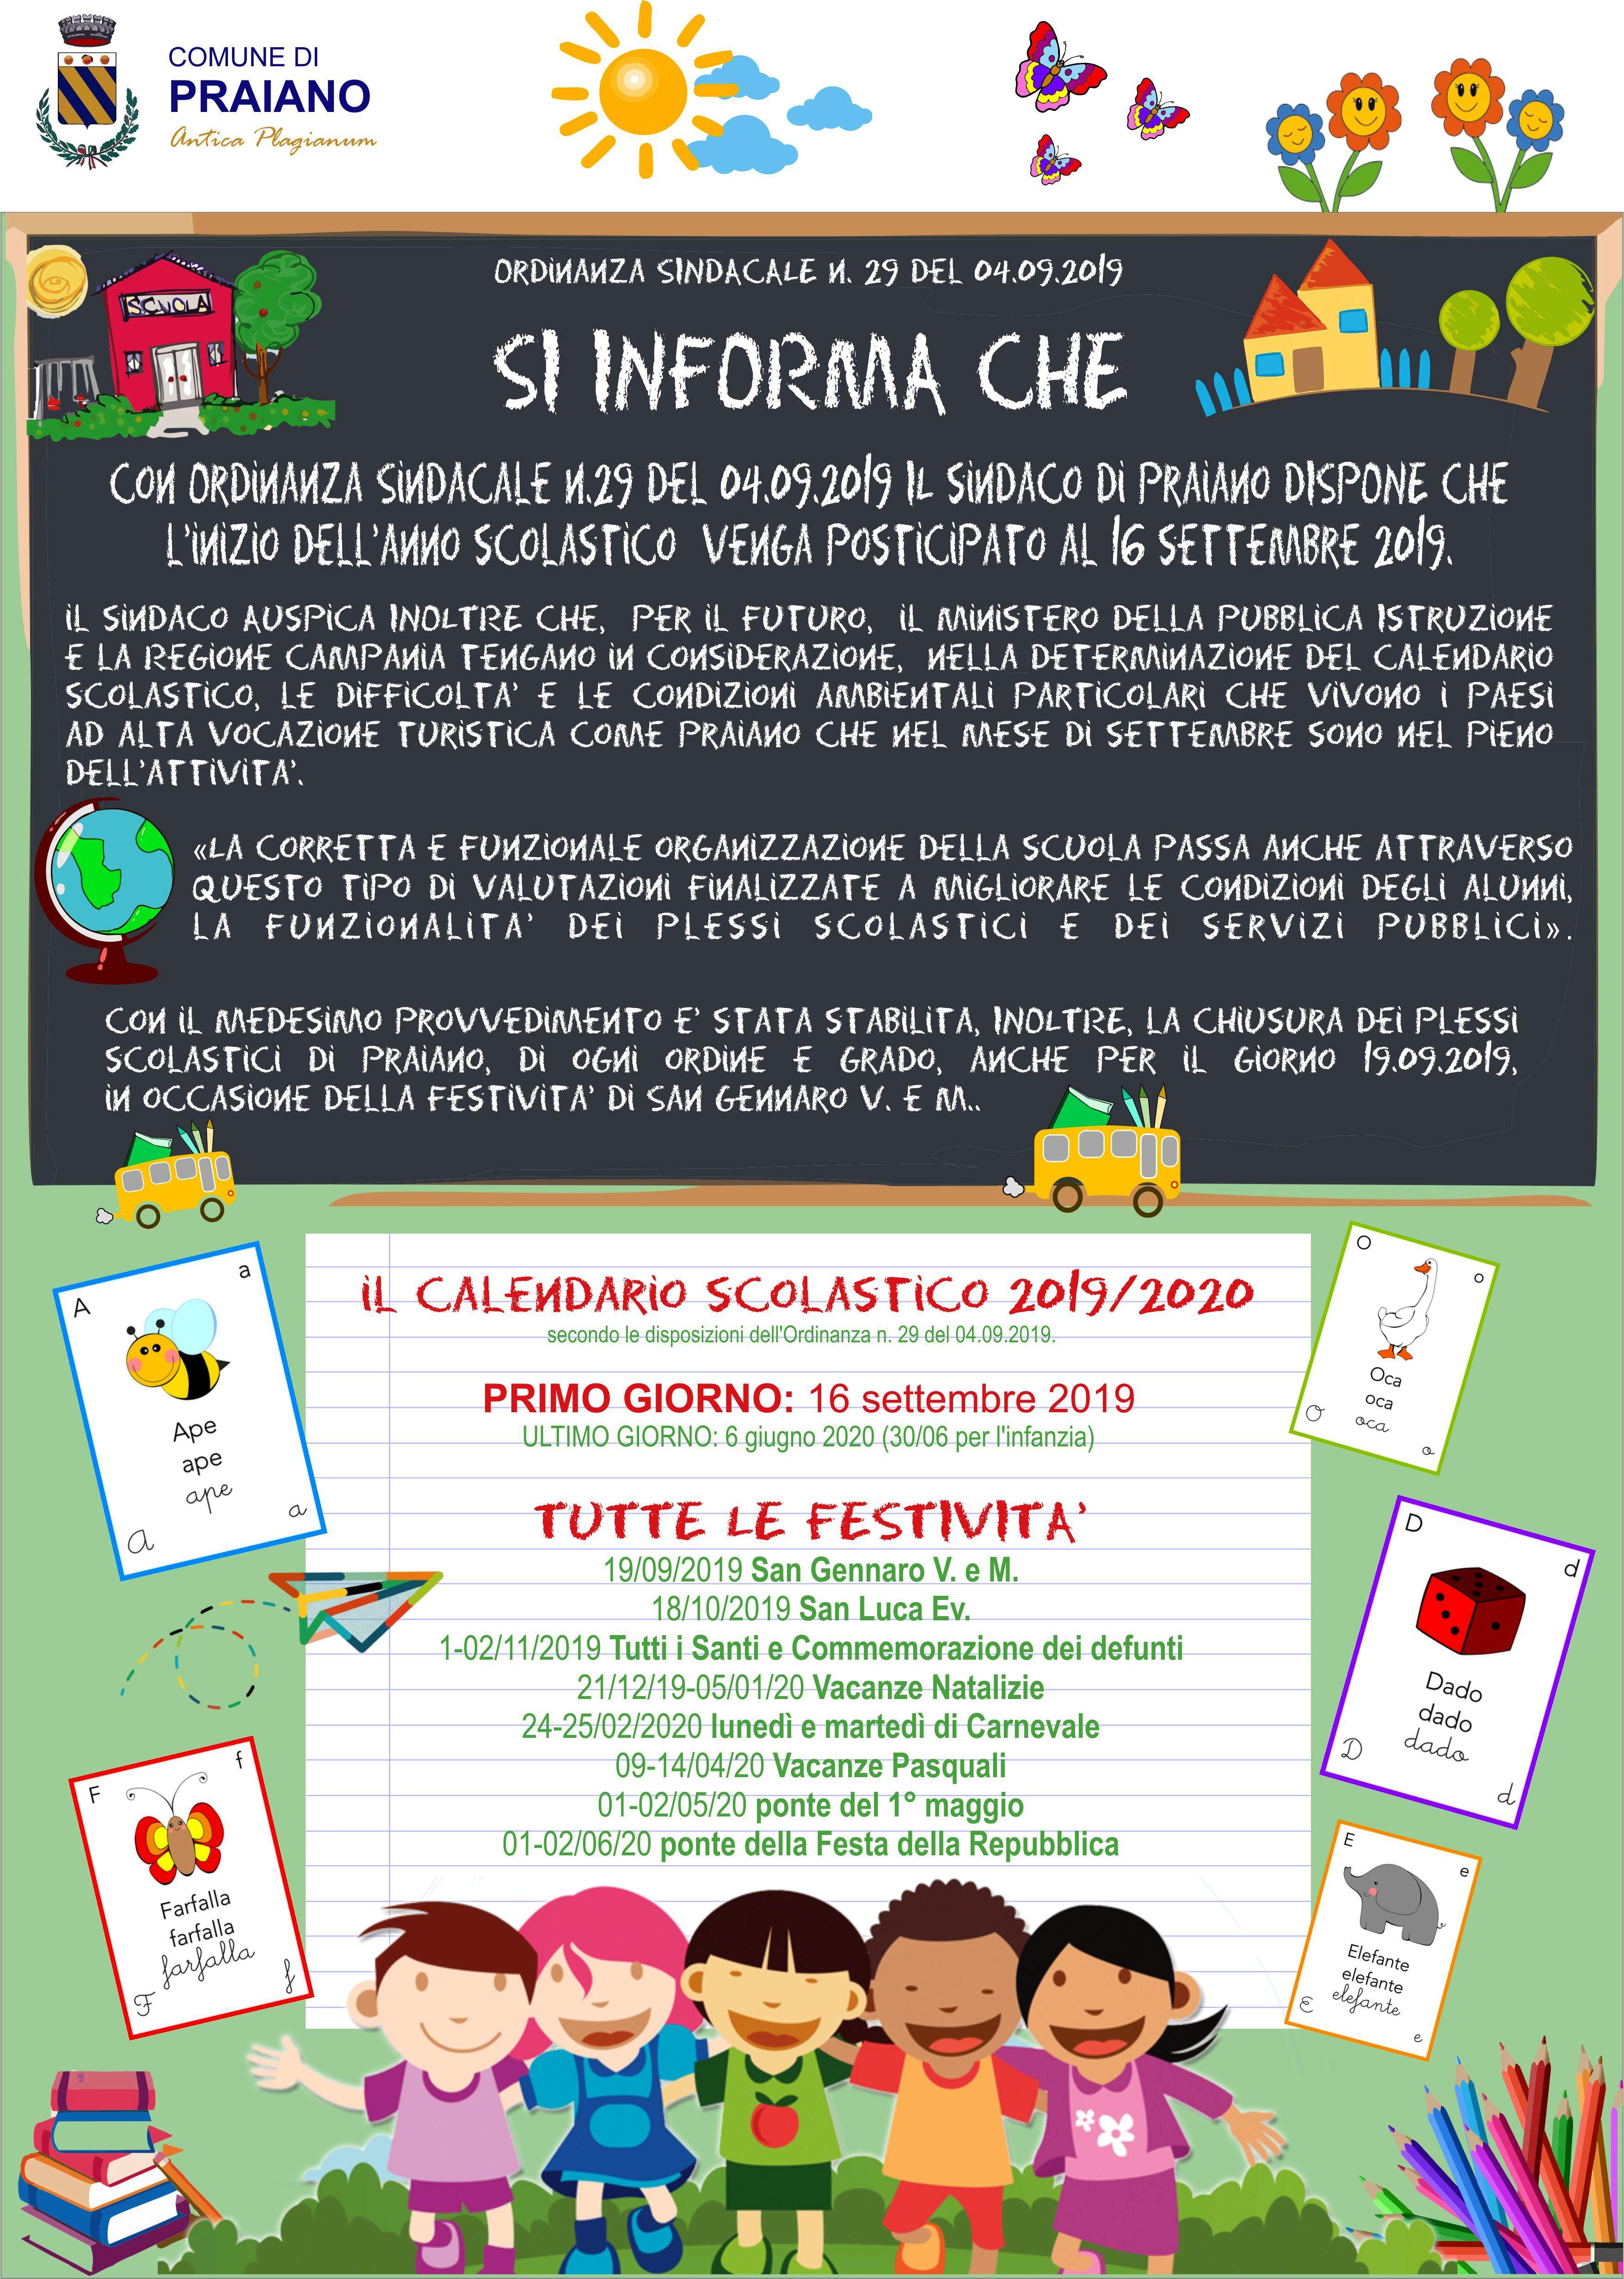 Raccolta Rifiuti Ingombranti Roma Calendario 2020 Municipi Dispari.News La Giunta Informa